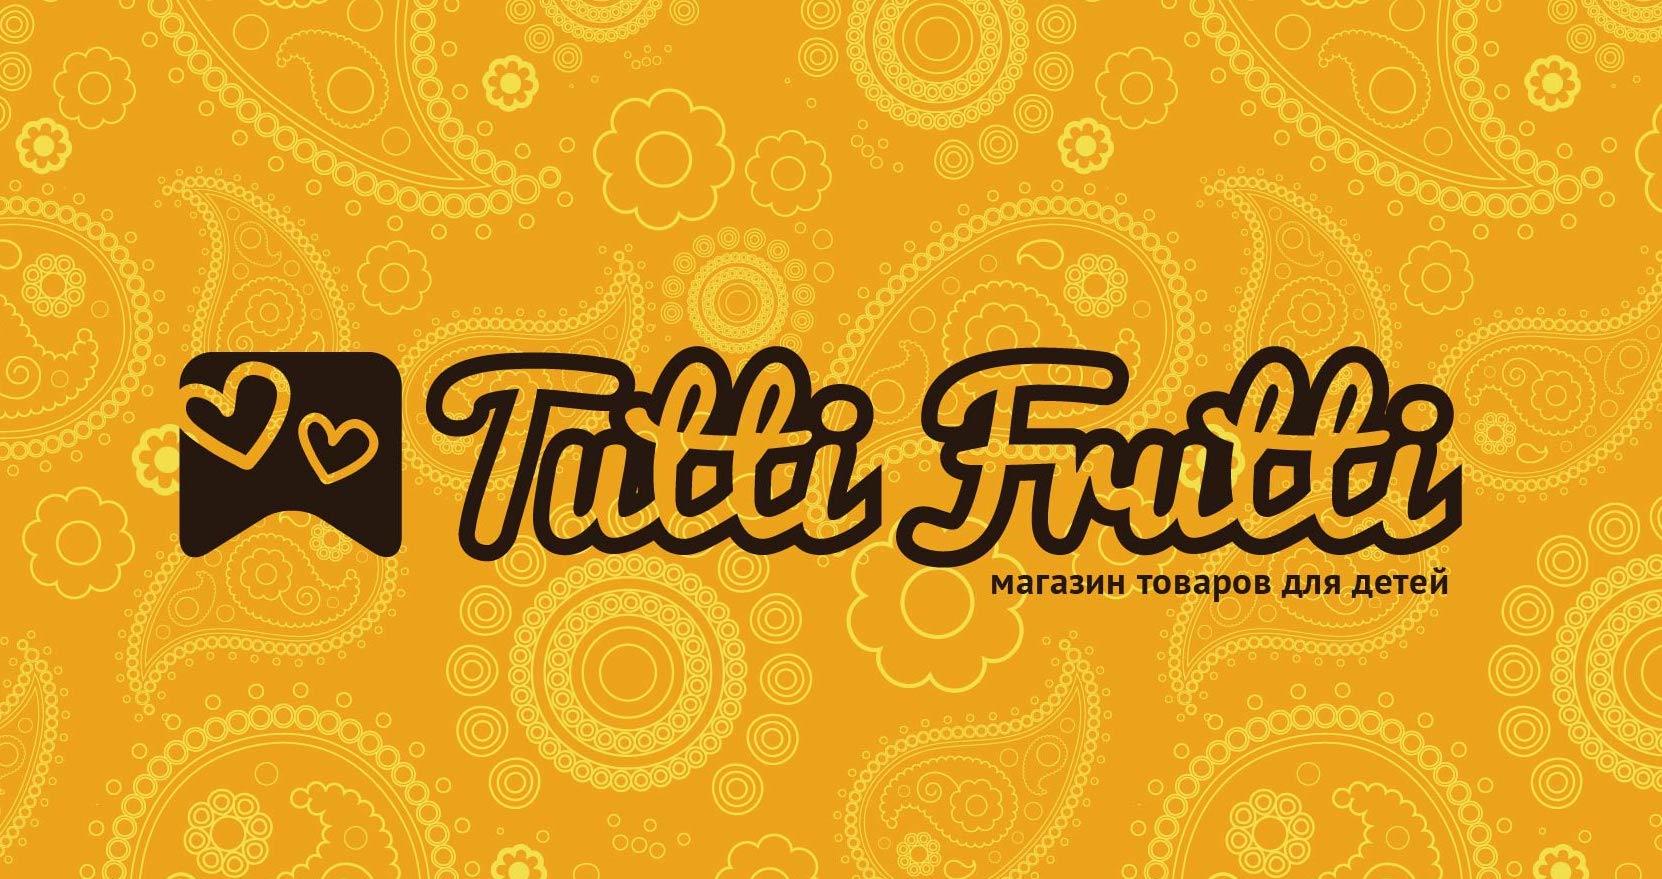 Логотип магазина товаровЛоготип магазина товаров для детей Tutti Frutti